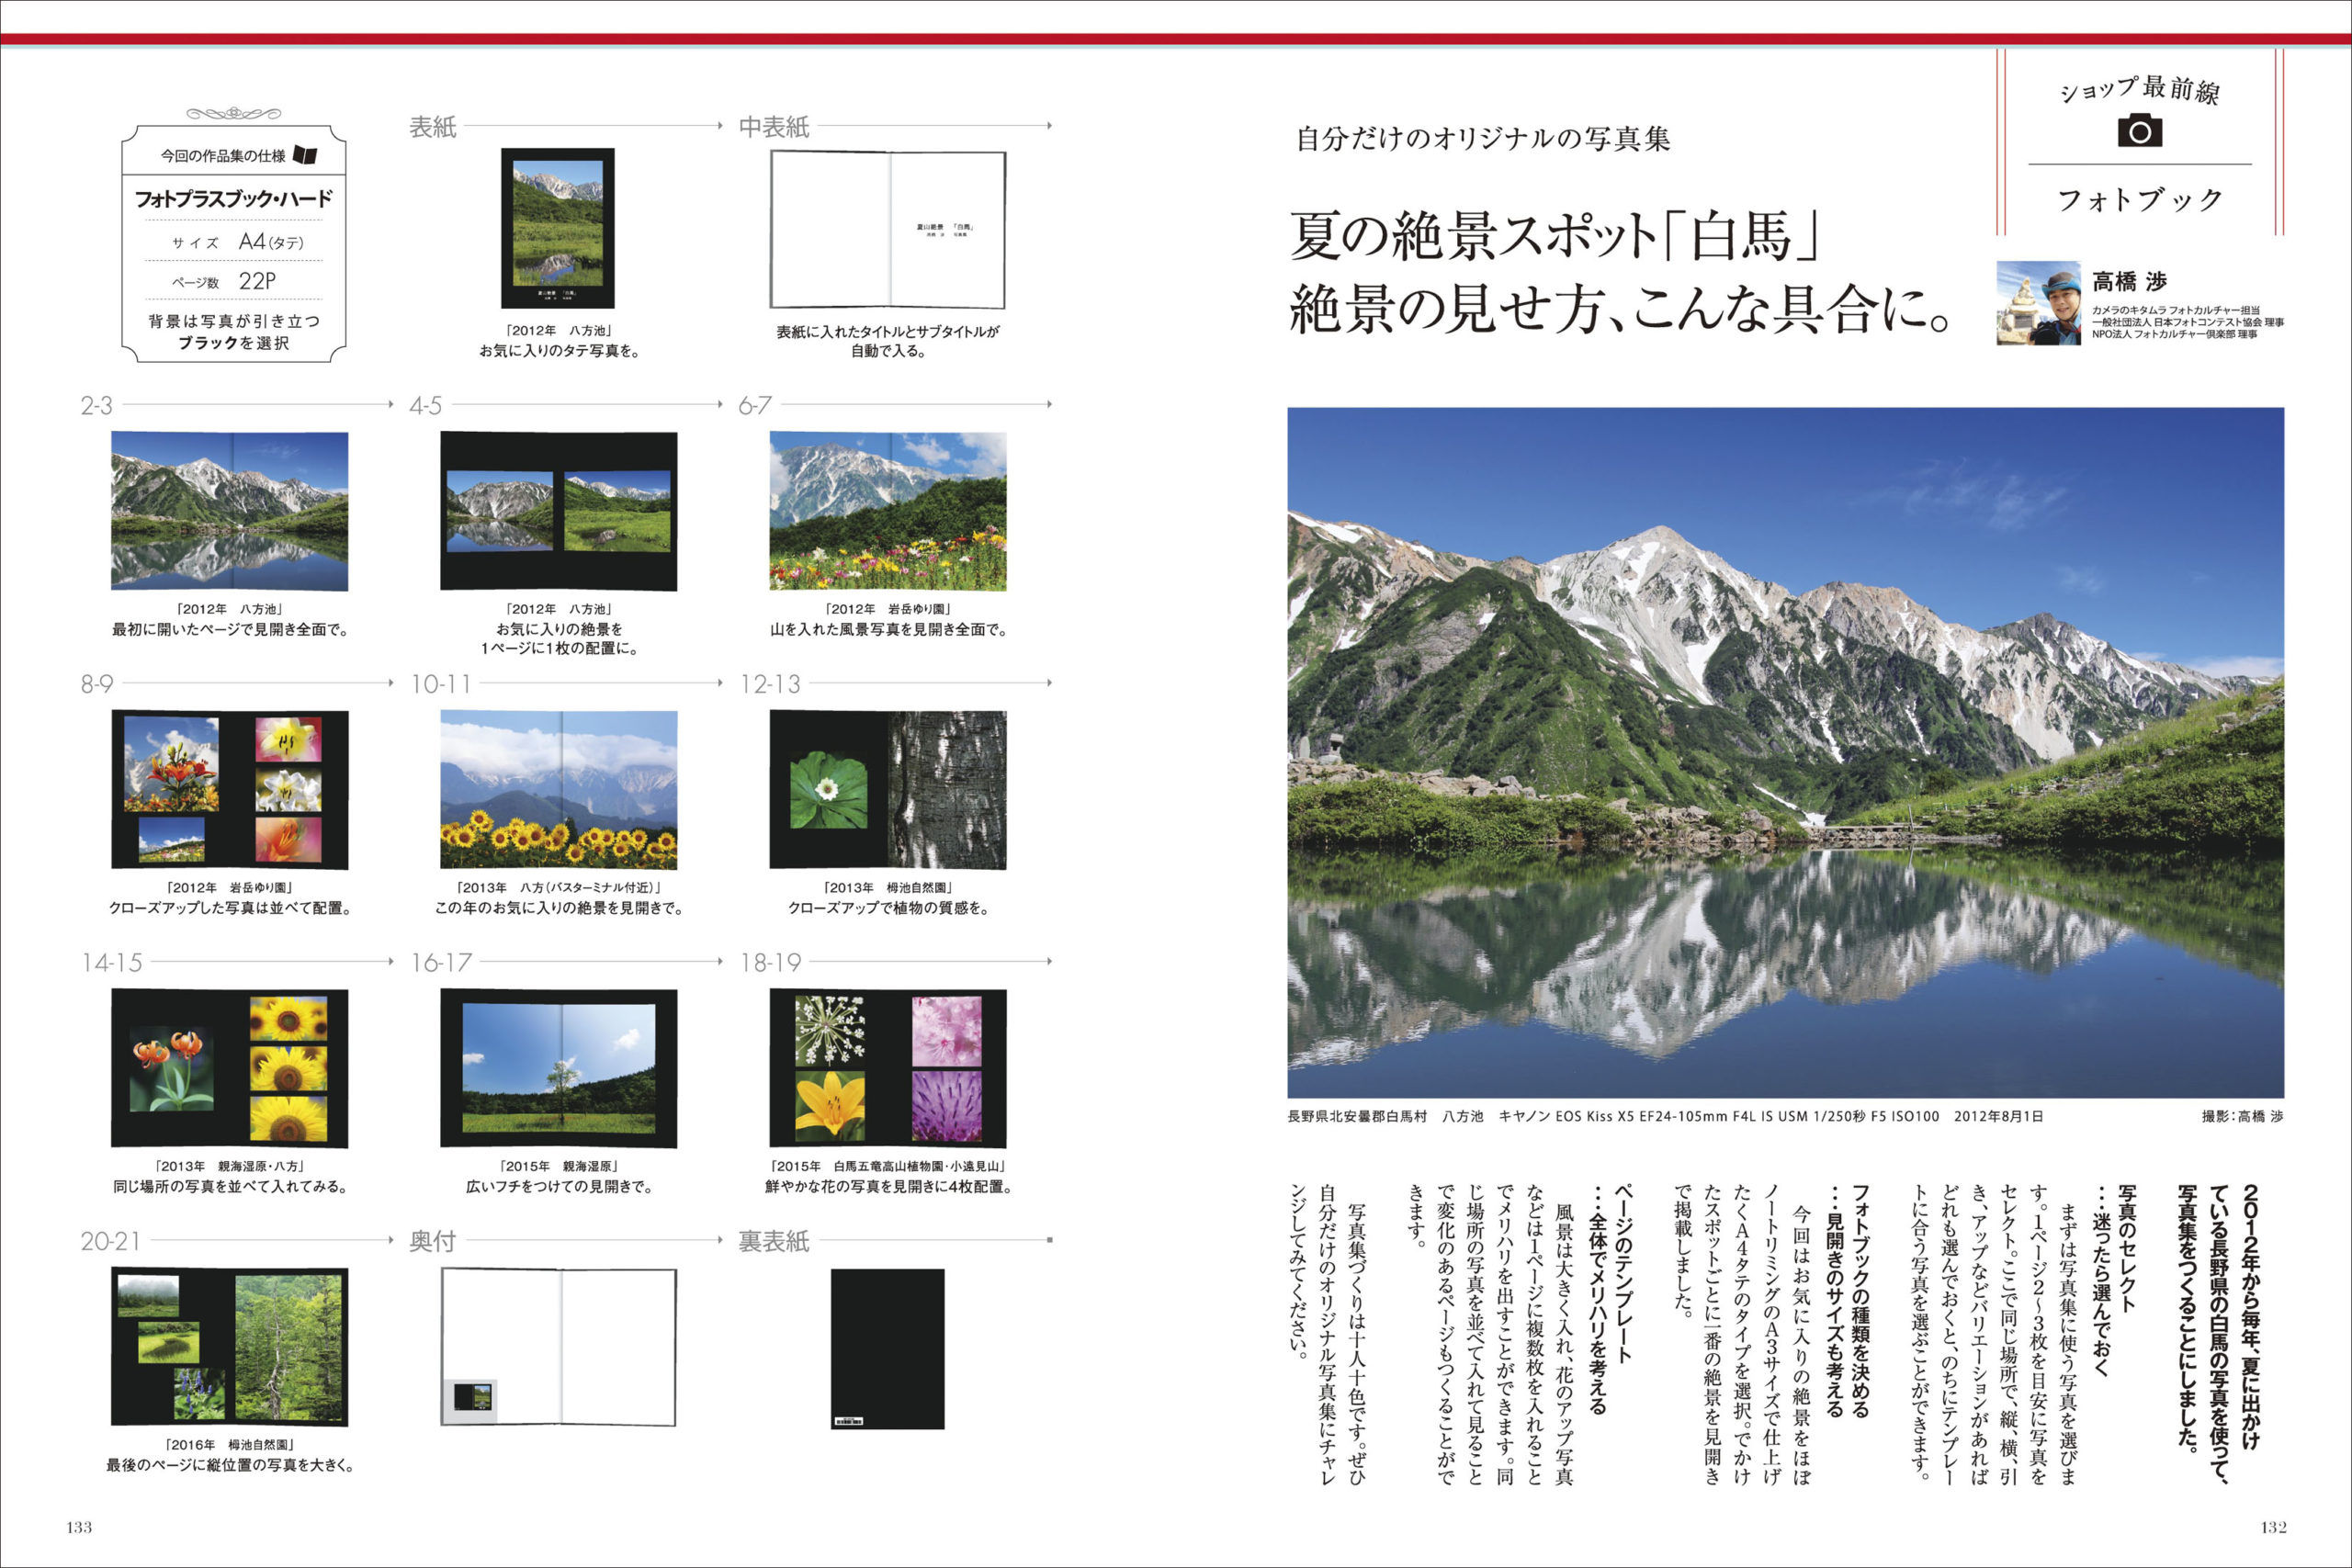 K_photocon_Summer_P132-133